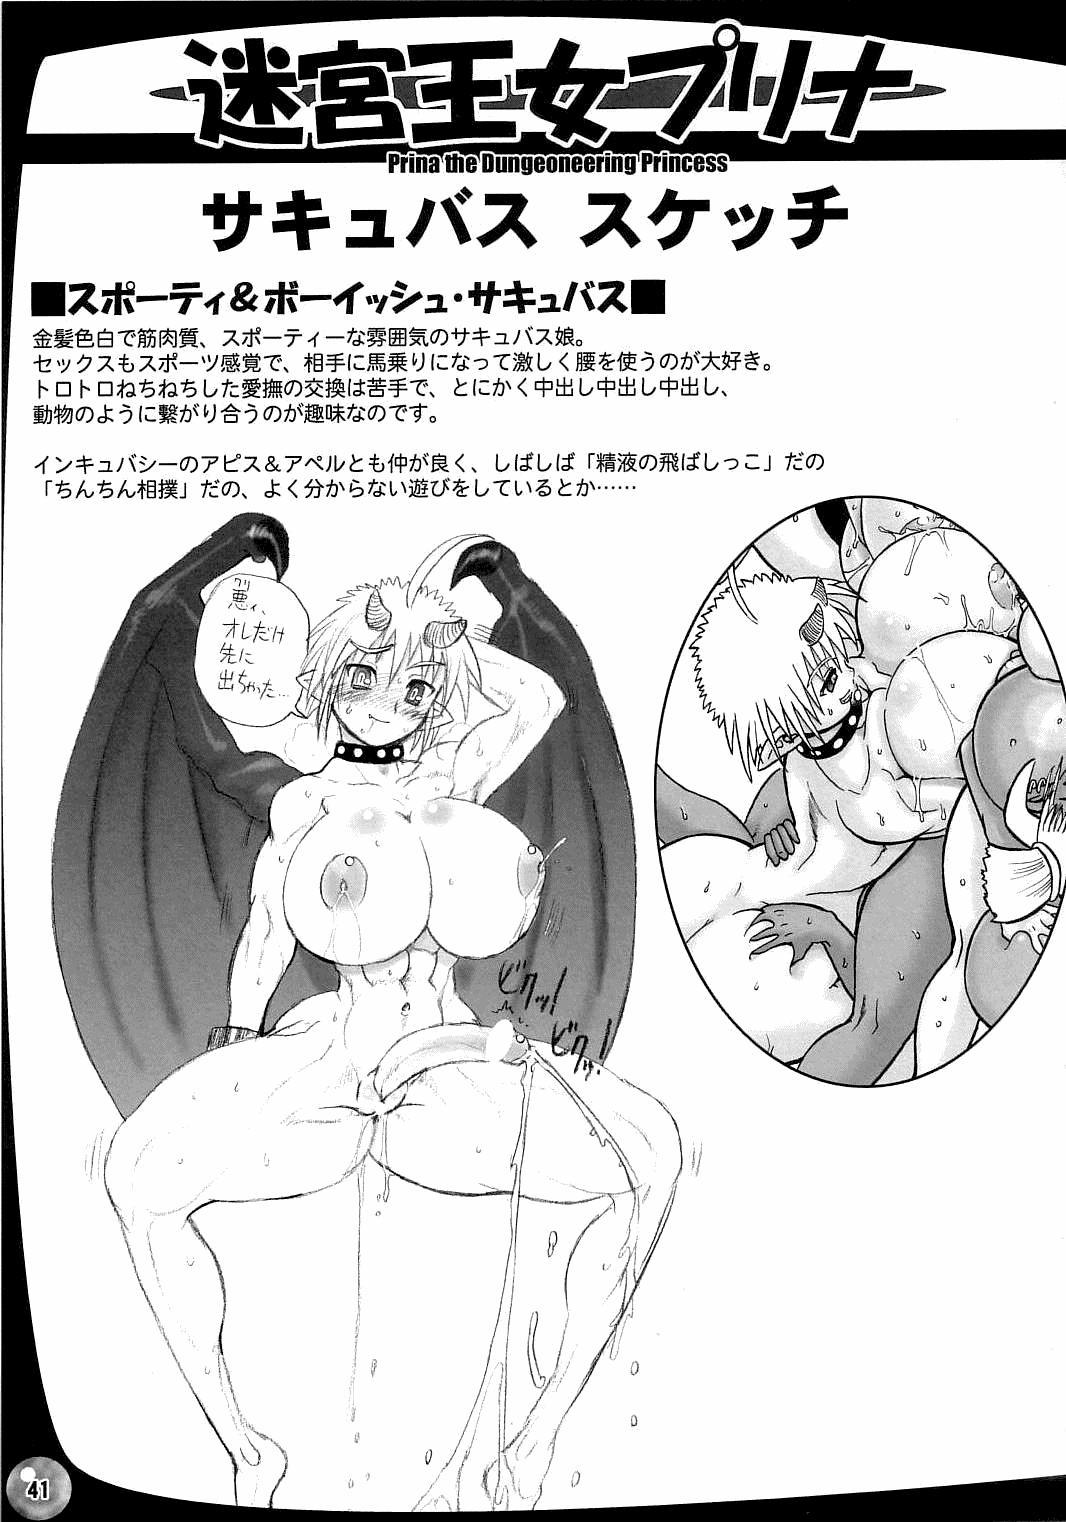 The Great Work of Alchemy Vol.15 - Meikyuu Oujo Prina 2 | Prina the Dungeoneering Princess 2 40